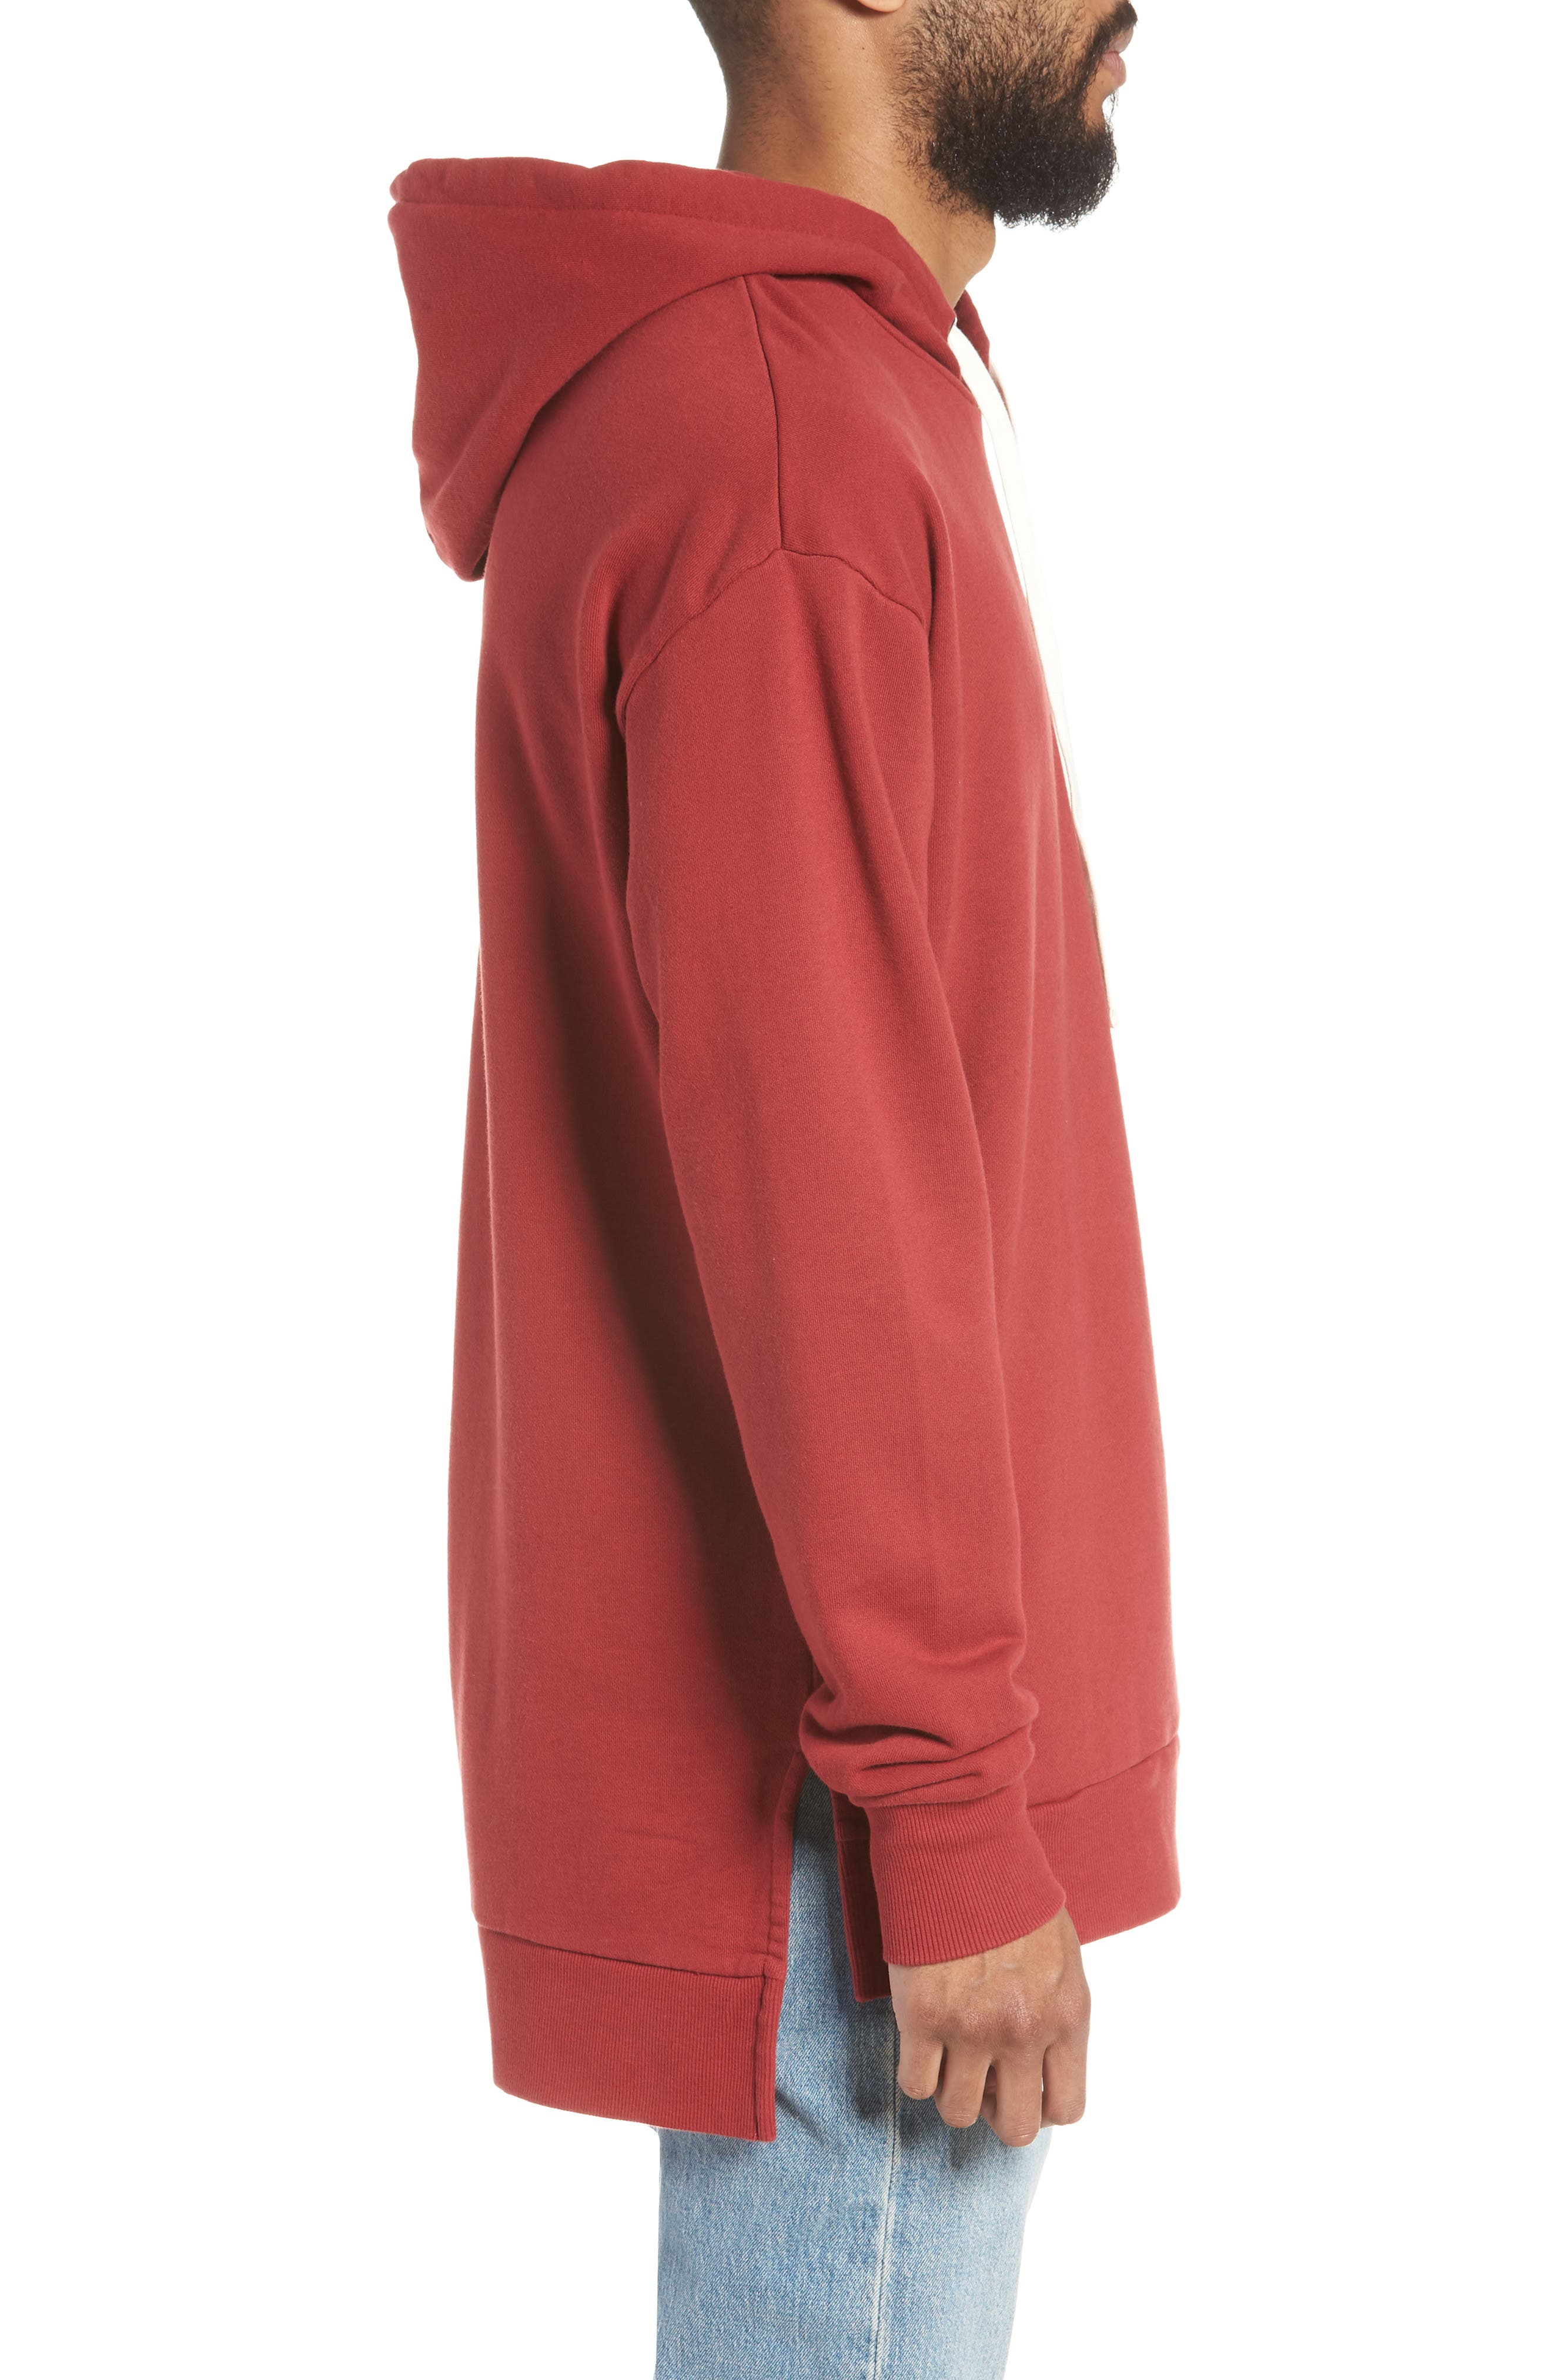 Rugger Hooded Sweatshirt,                             Alternate thumbnail 4, color,                             Dark Cherry